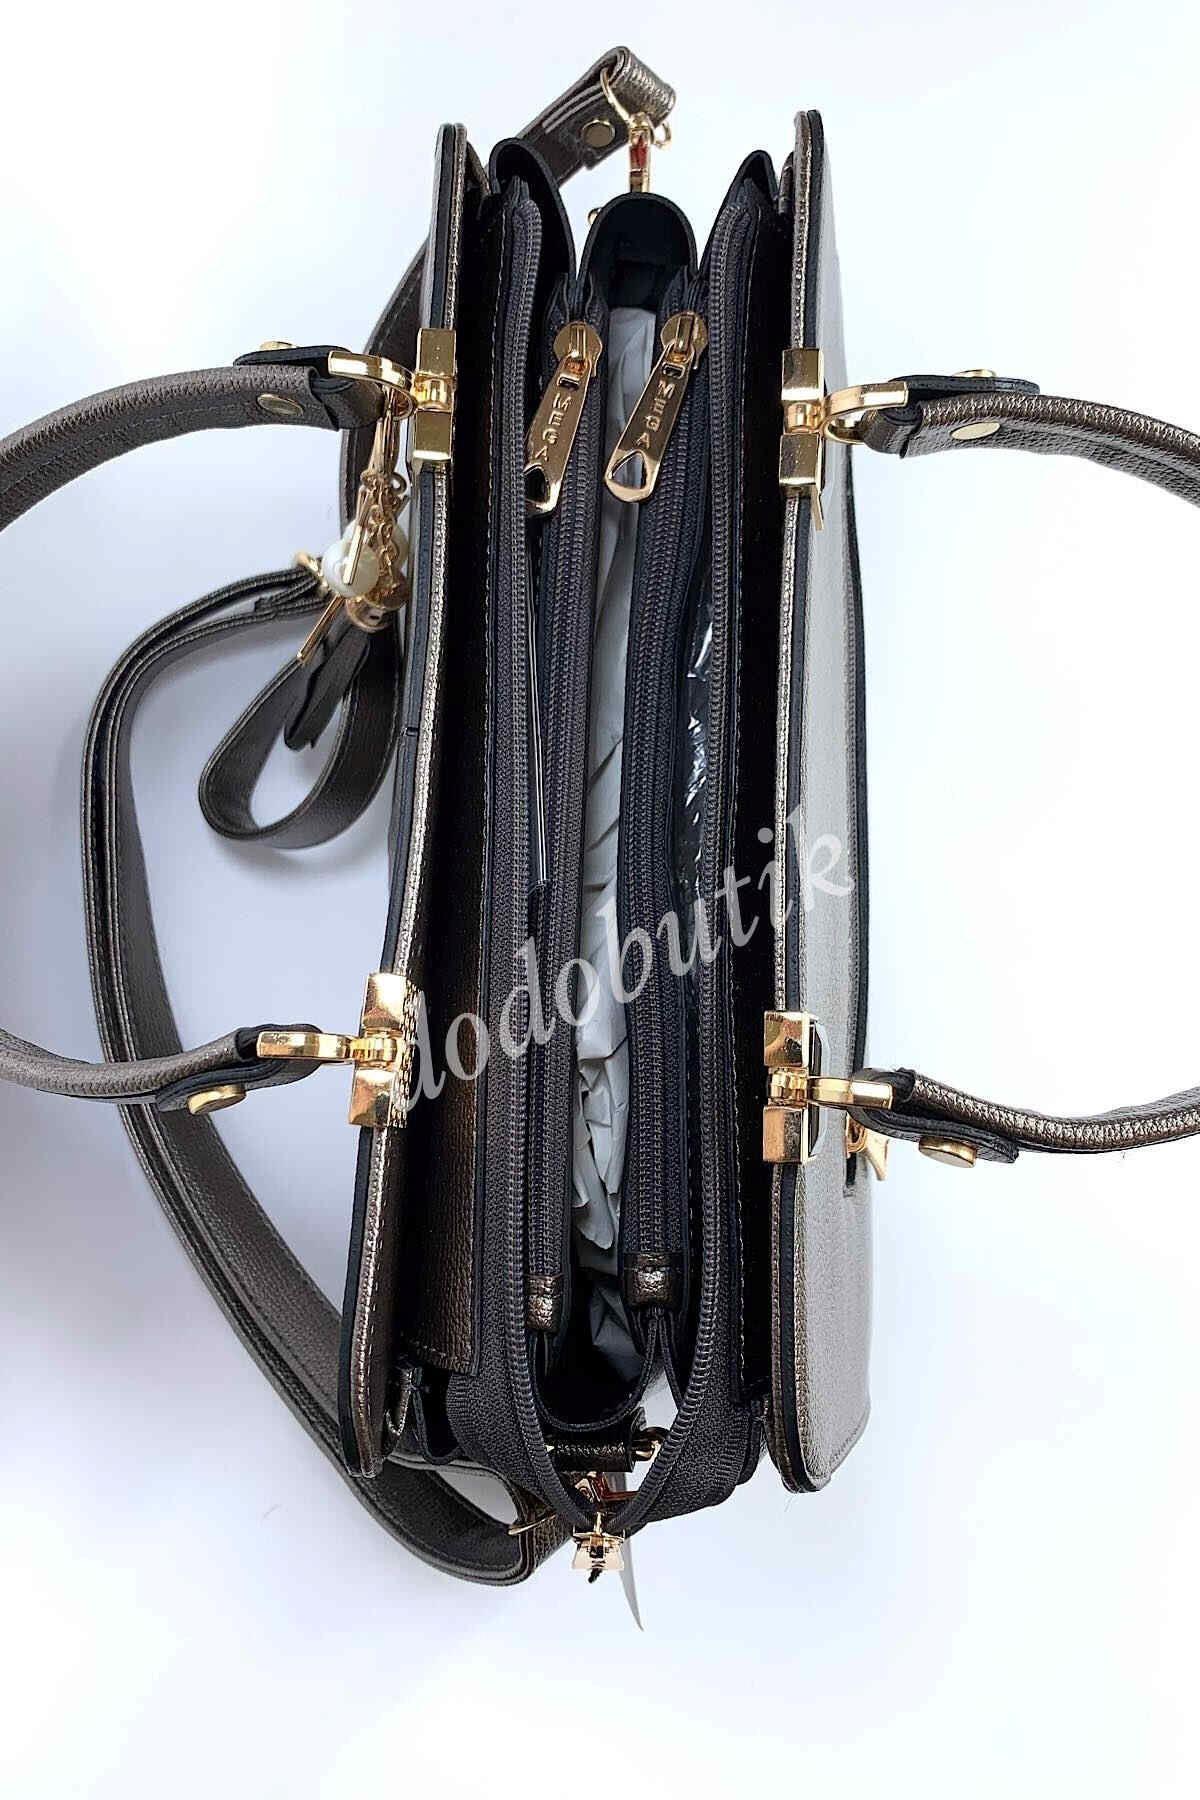 Metalik Gri Klasik Kol Çantası M-903